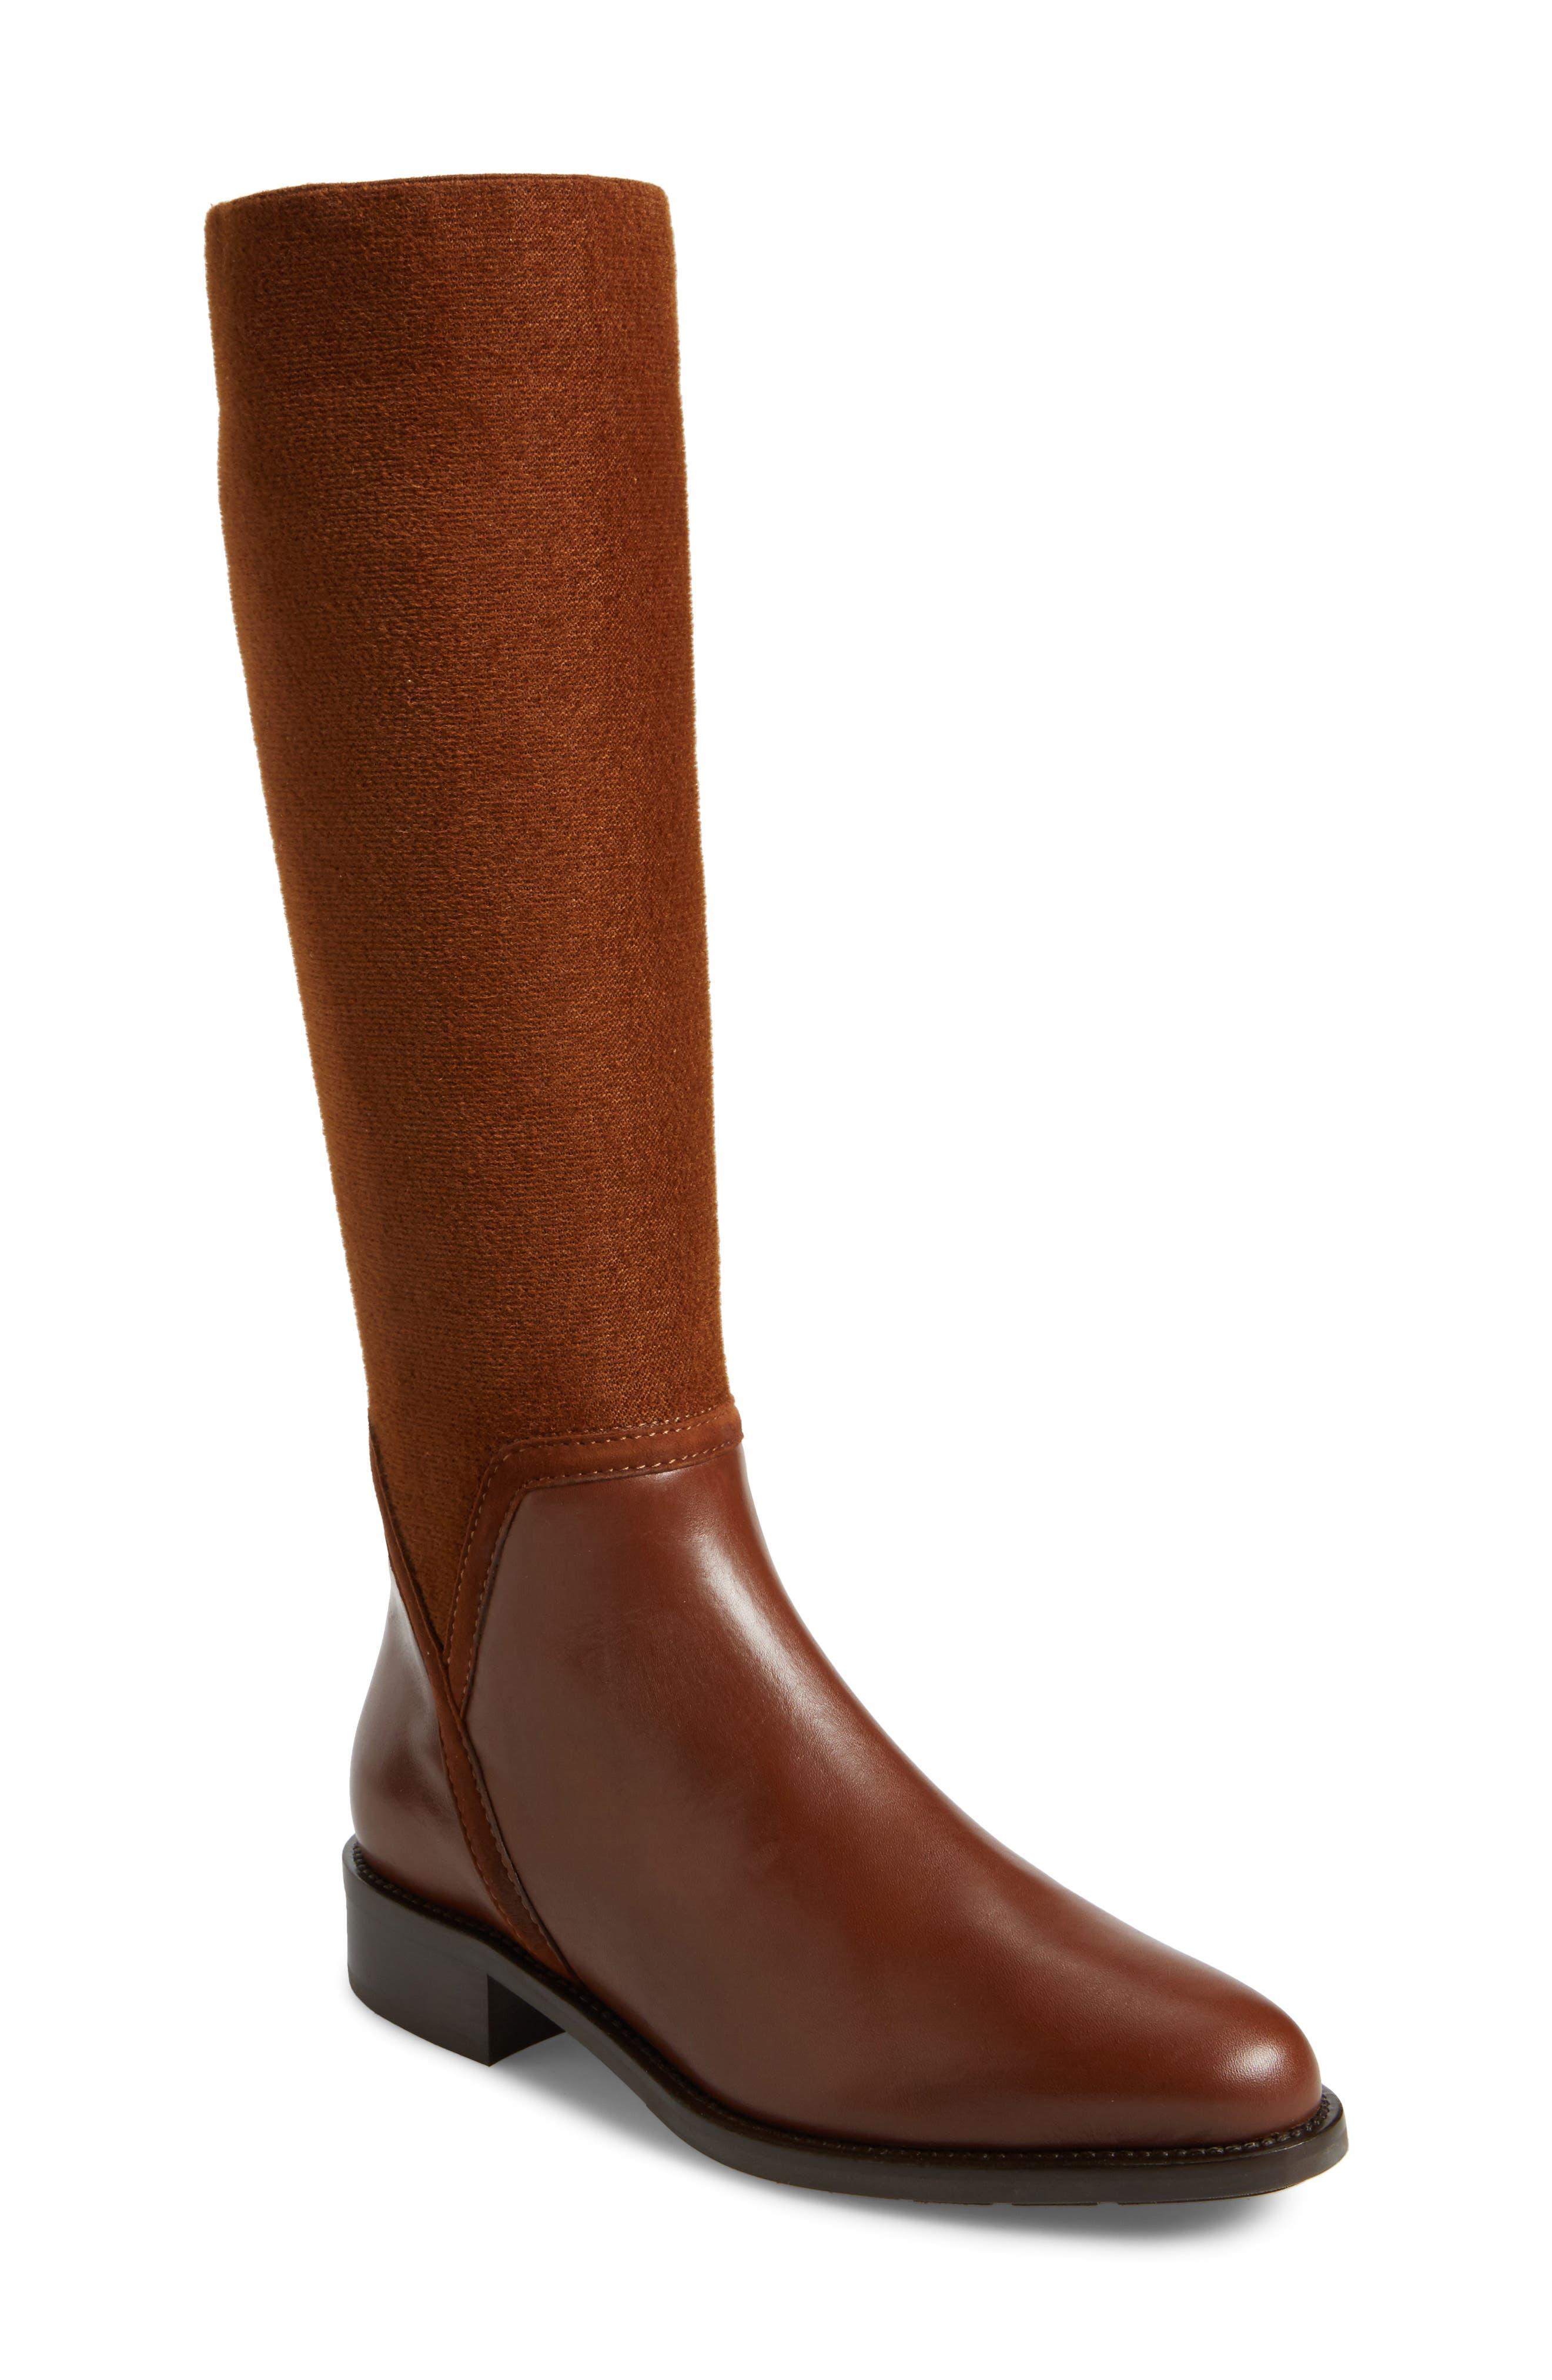 Main Image - Aquatalia Nicolette Weatherproof Knee High Boot (Women)